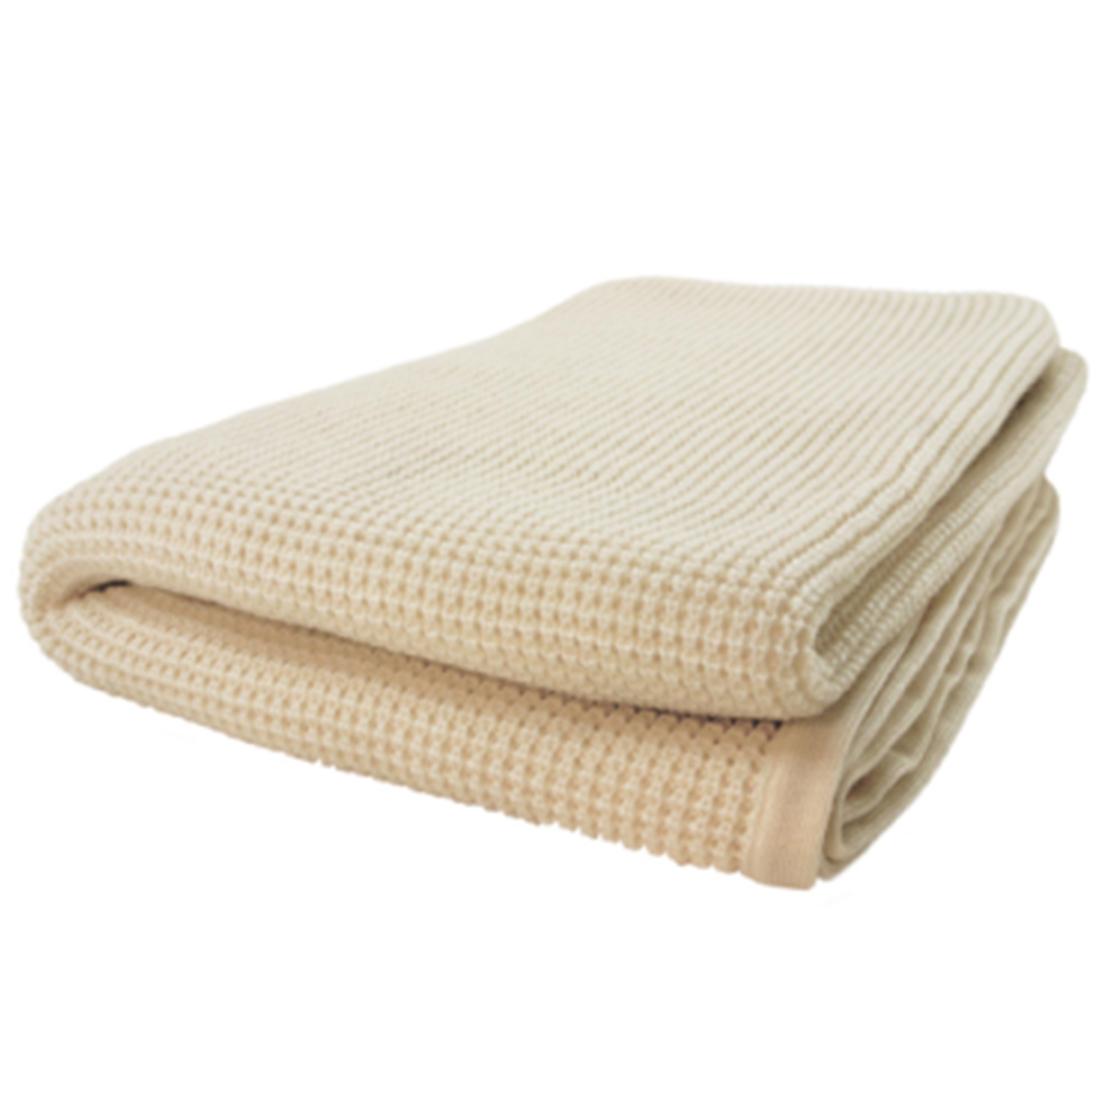 Indigo7 Authorized 50/50 Thermal Cashmere Wool Blend Throw Creme Fraiche